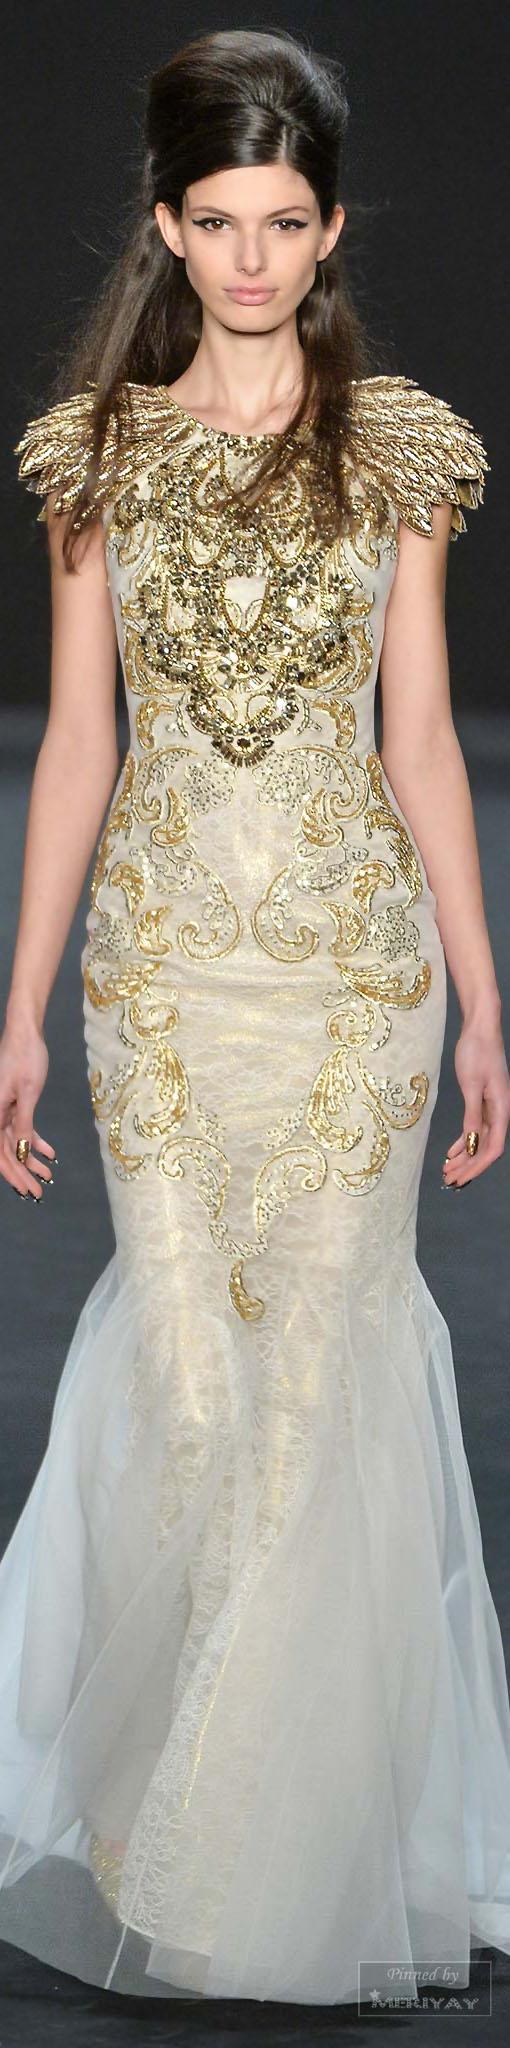 Badgley mischkafall fashioncatwalkgold pinterest